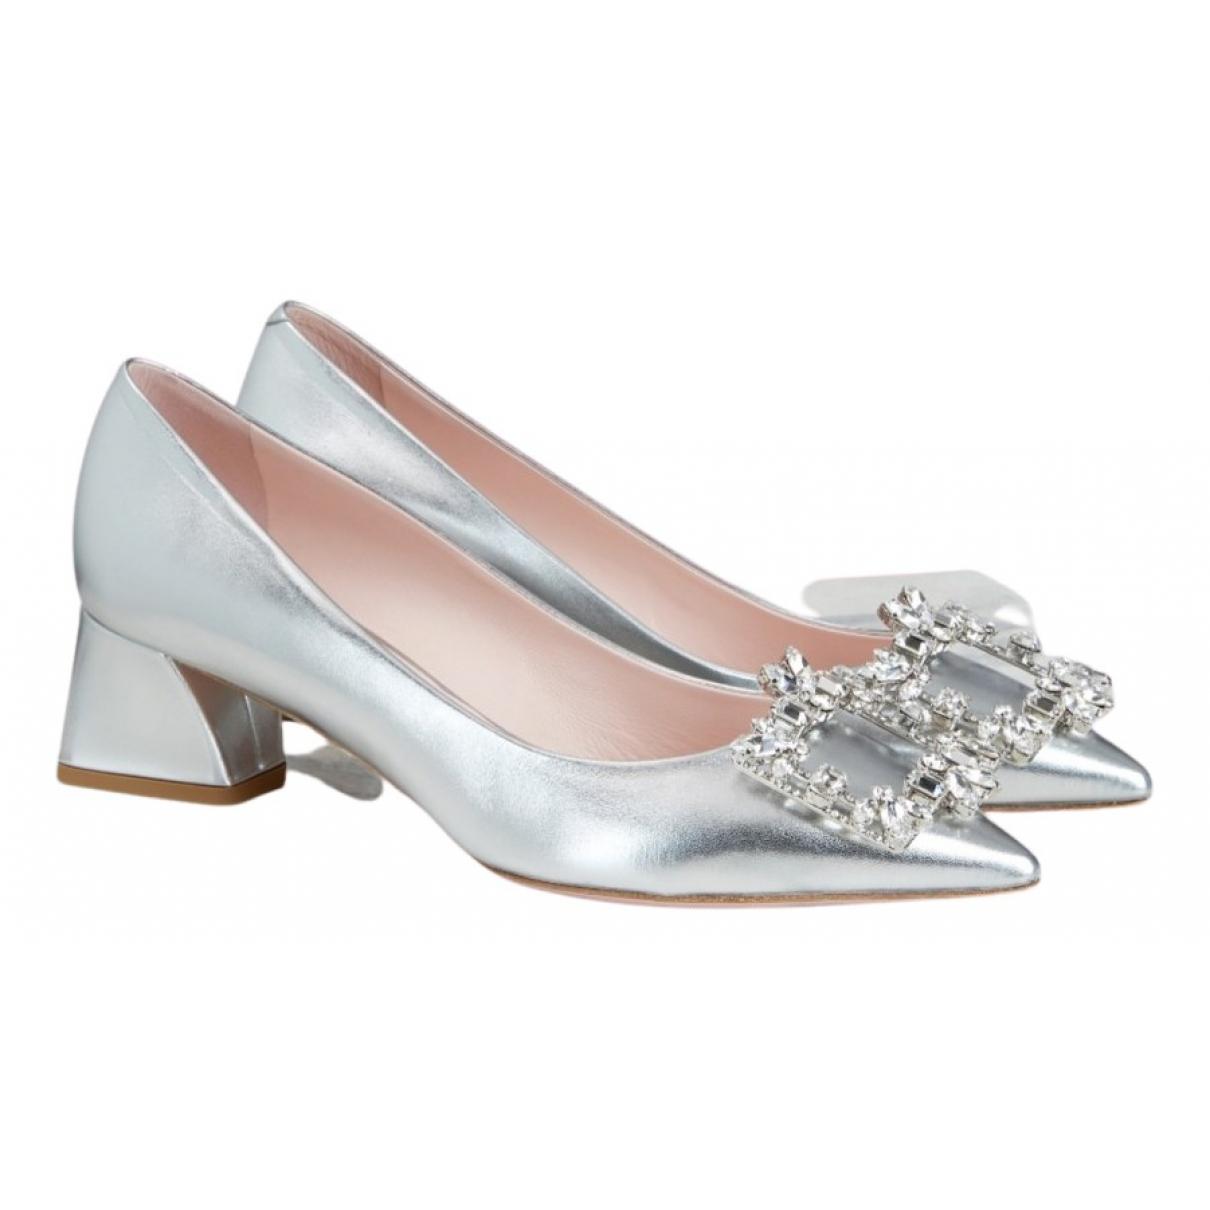 Roger Vivier Flower Strass Buckle Silver Leather Heels for Women 39.5 EU